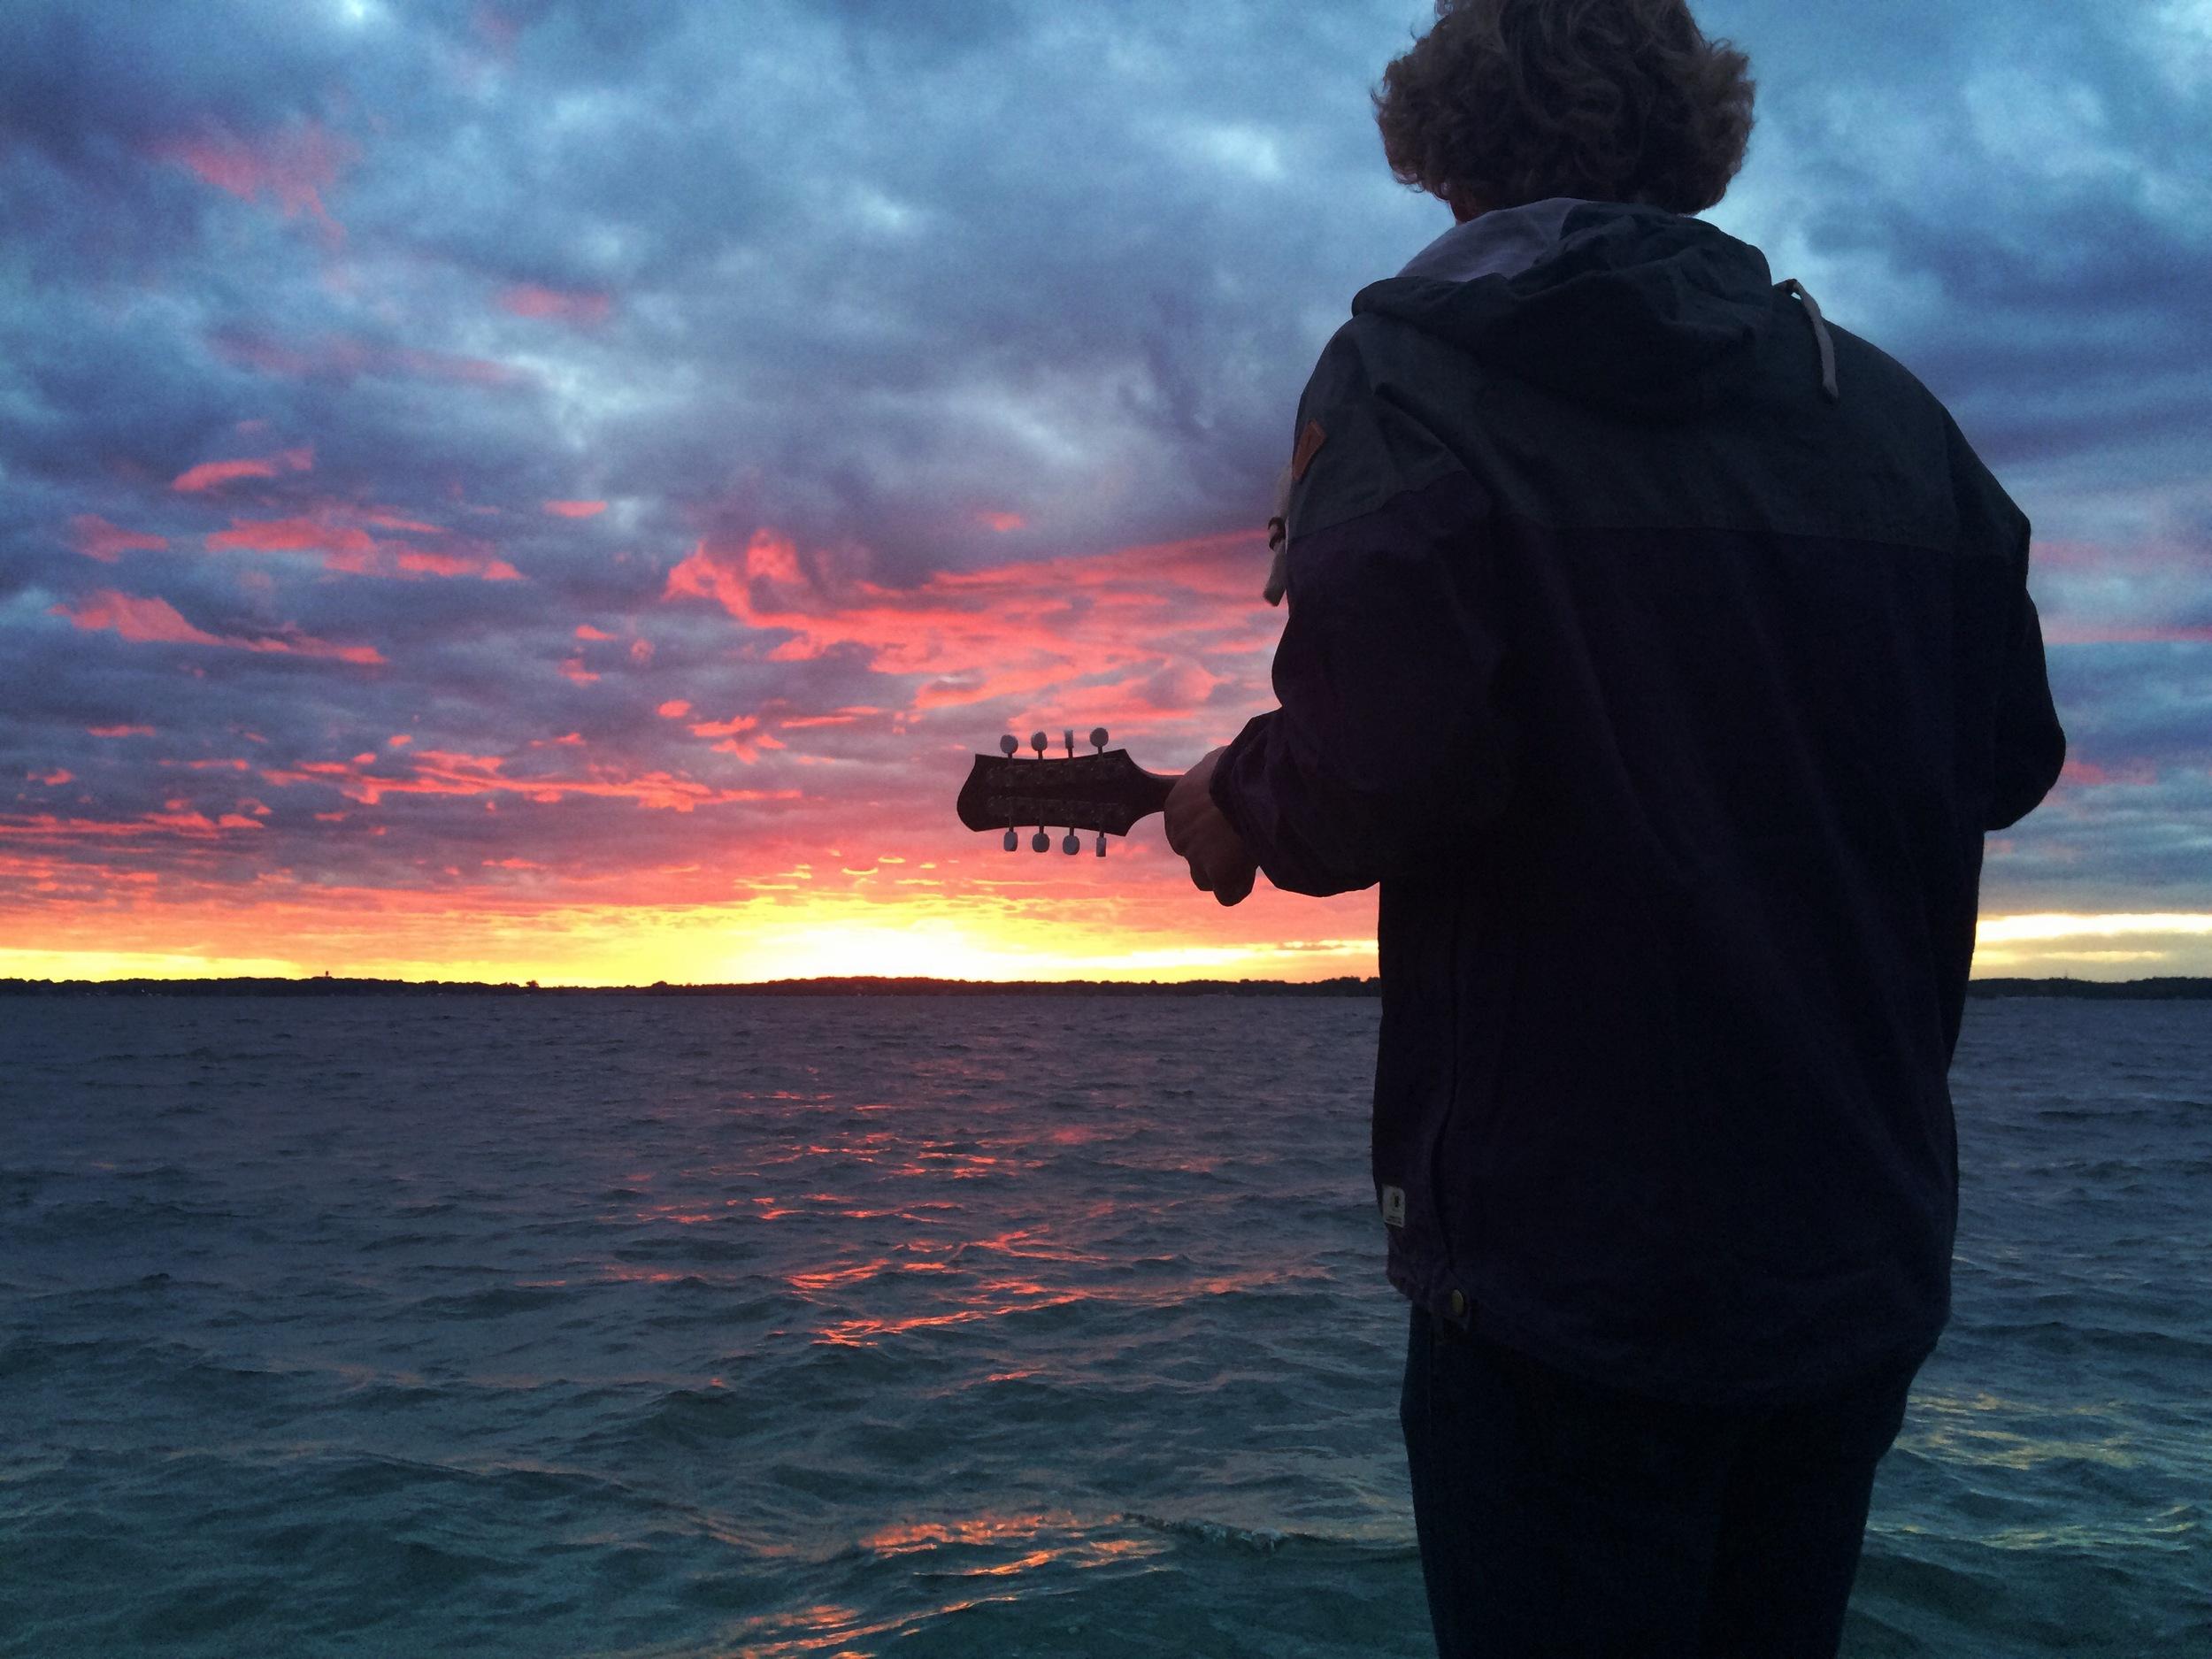 on the shores of Lake Minnetonka, Minnesota